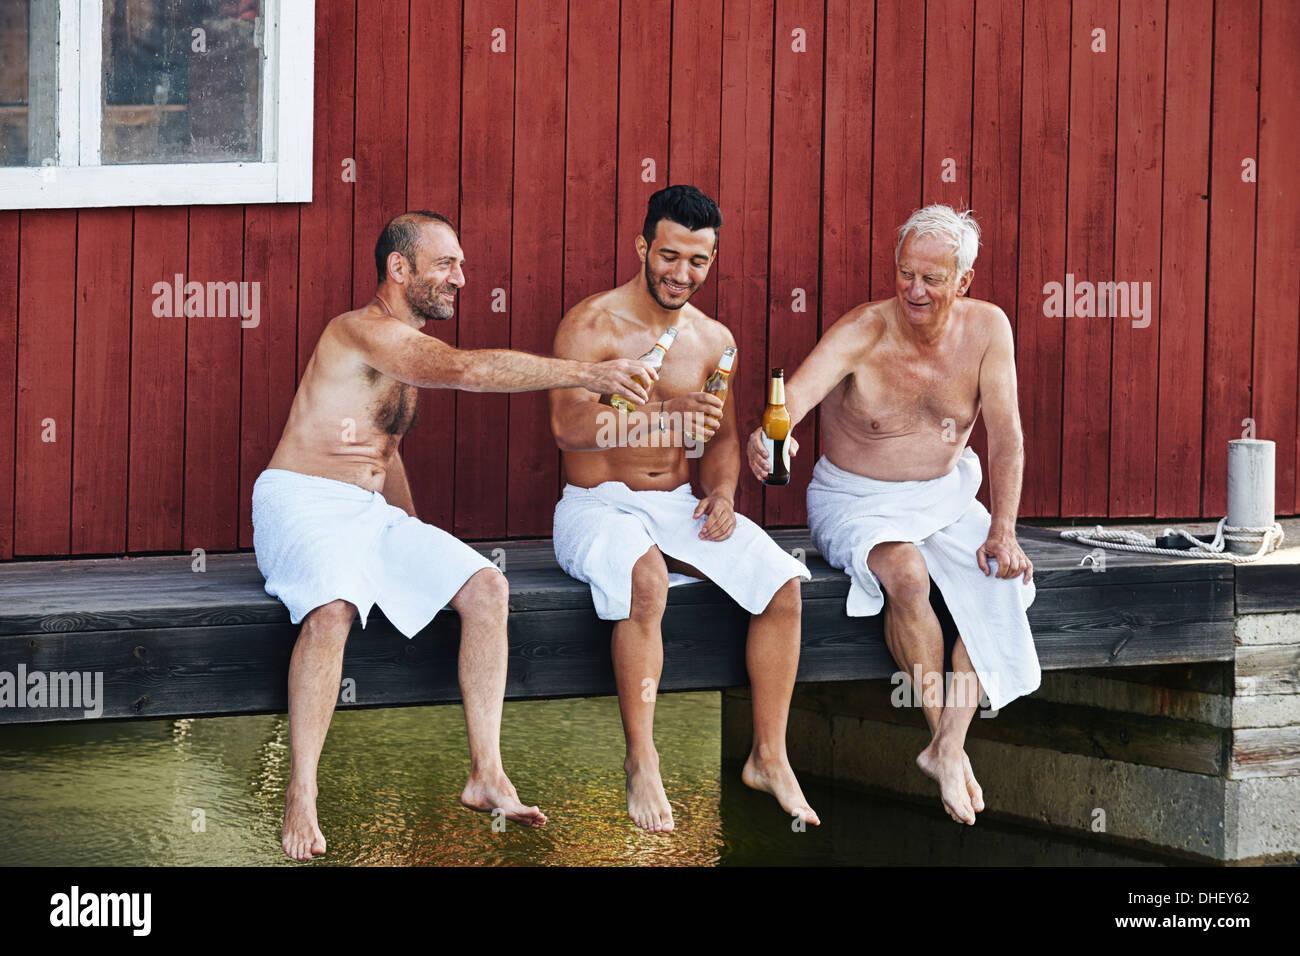 Three men sharing a beer outside sauna - Stock Image